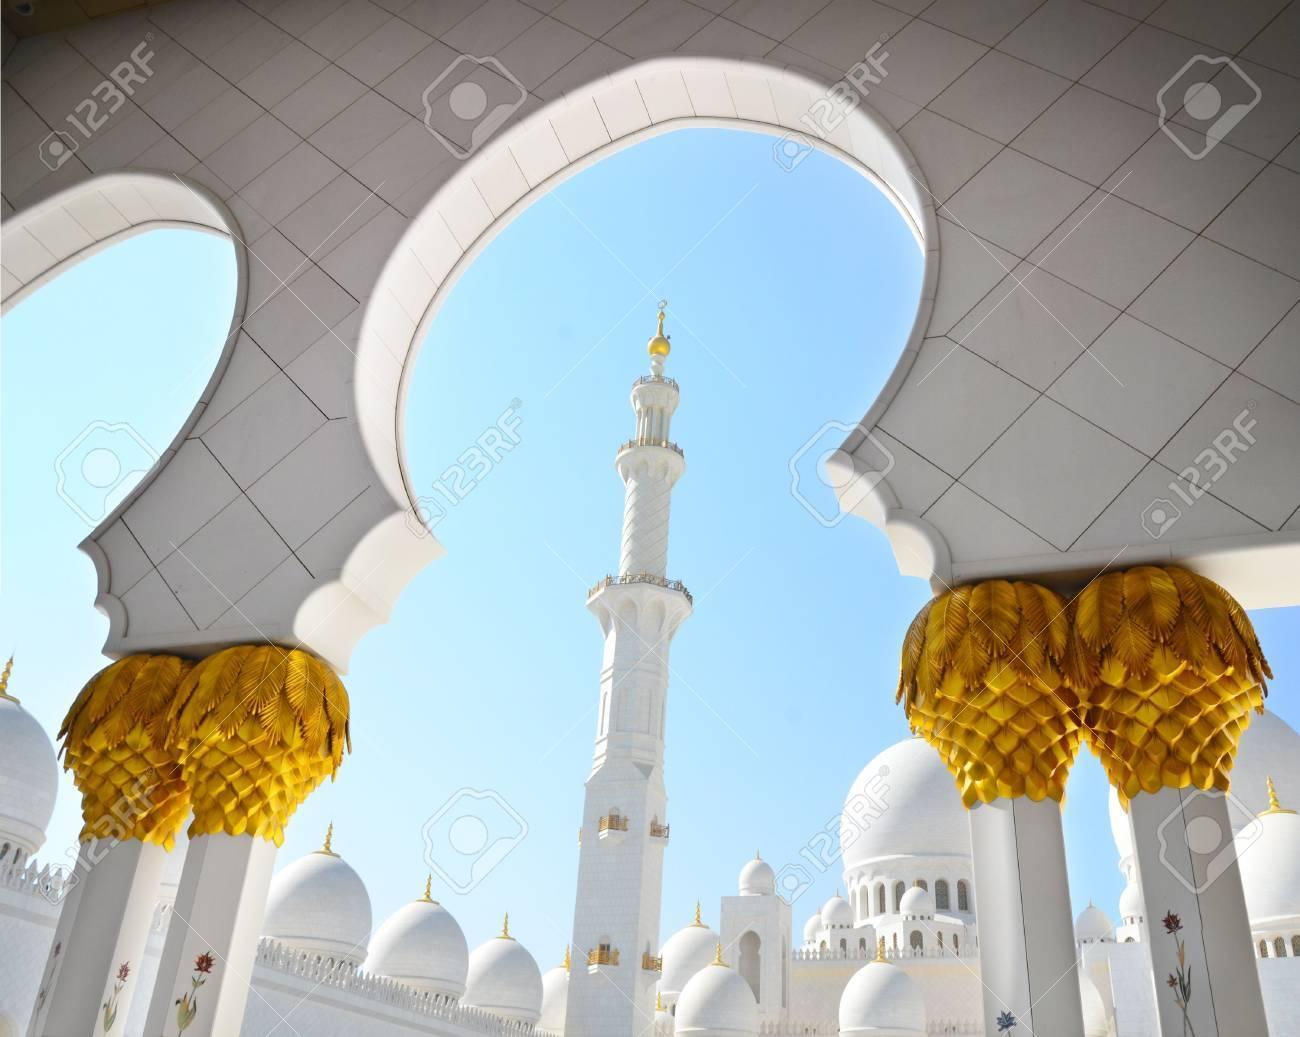 Sheikh Zayed Mosque in Abu Dhabi, United Arab Emirates - 11910437